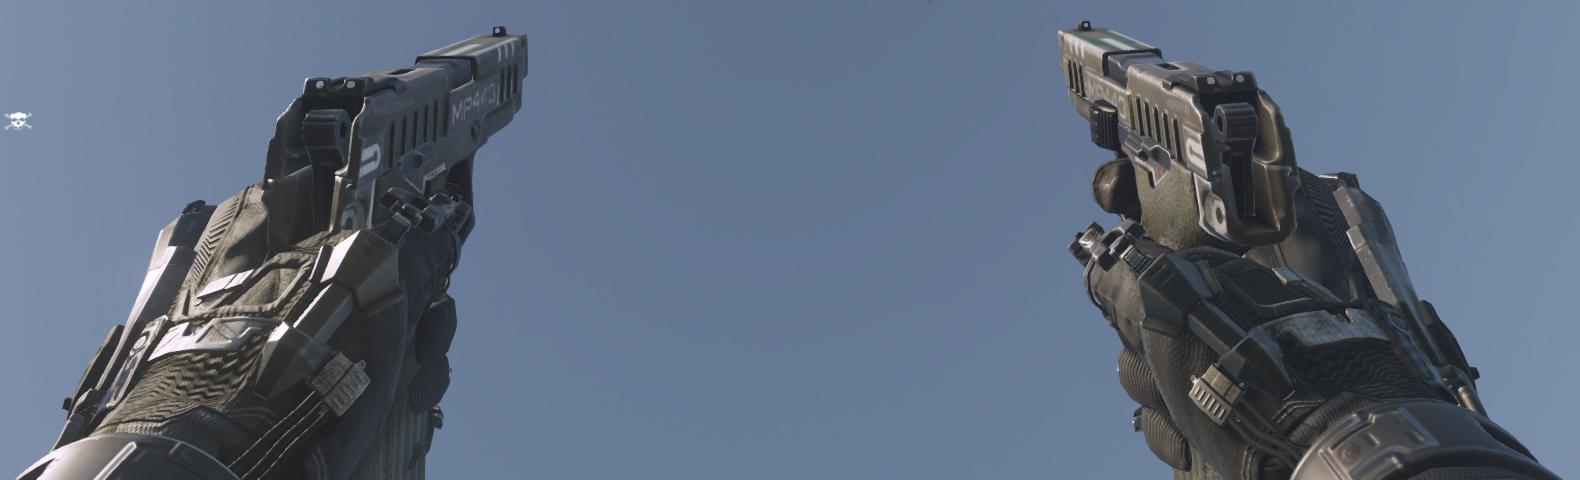 MP-443 Grach/Variants